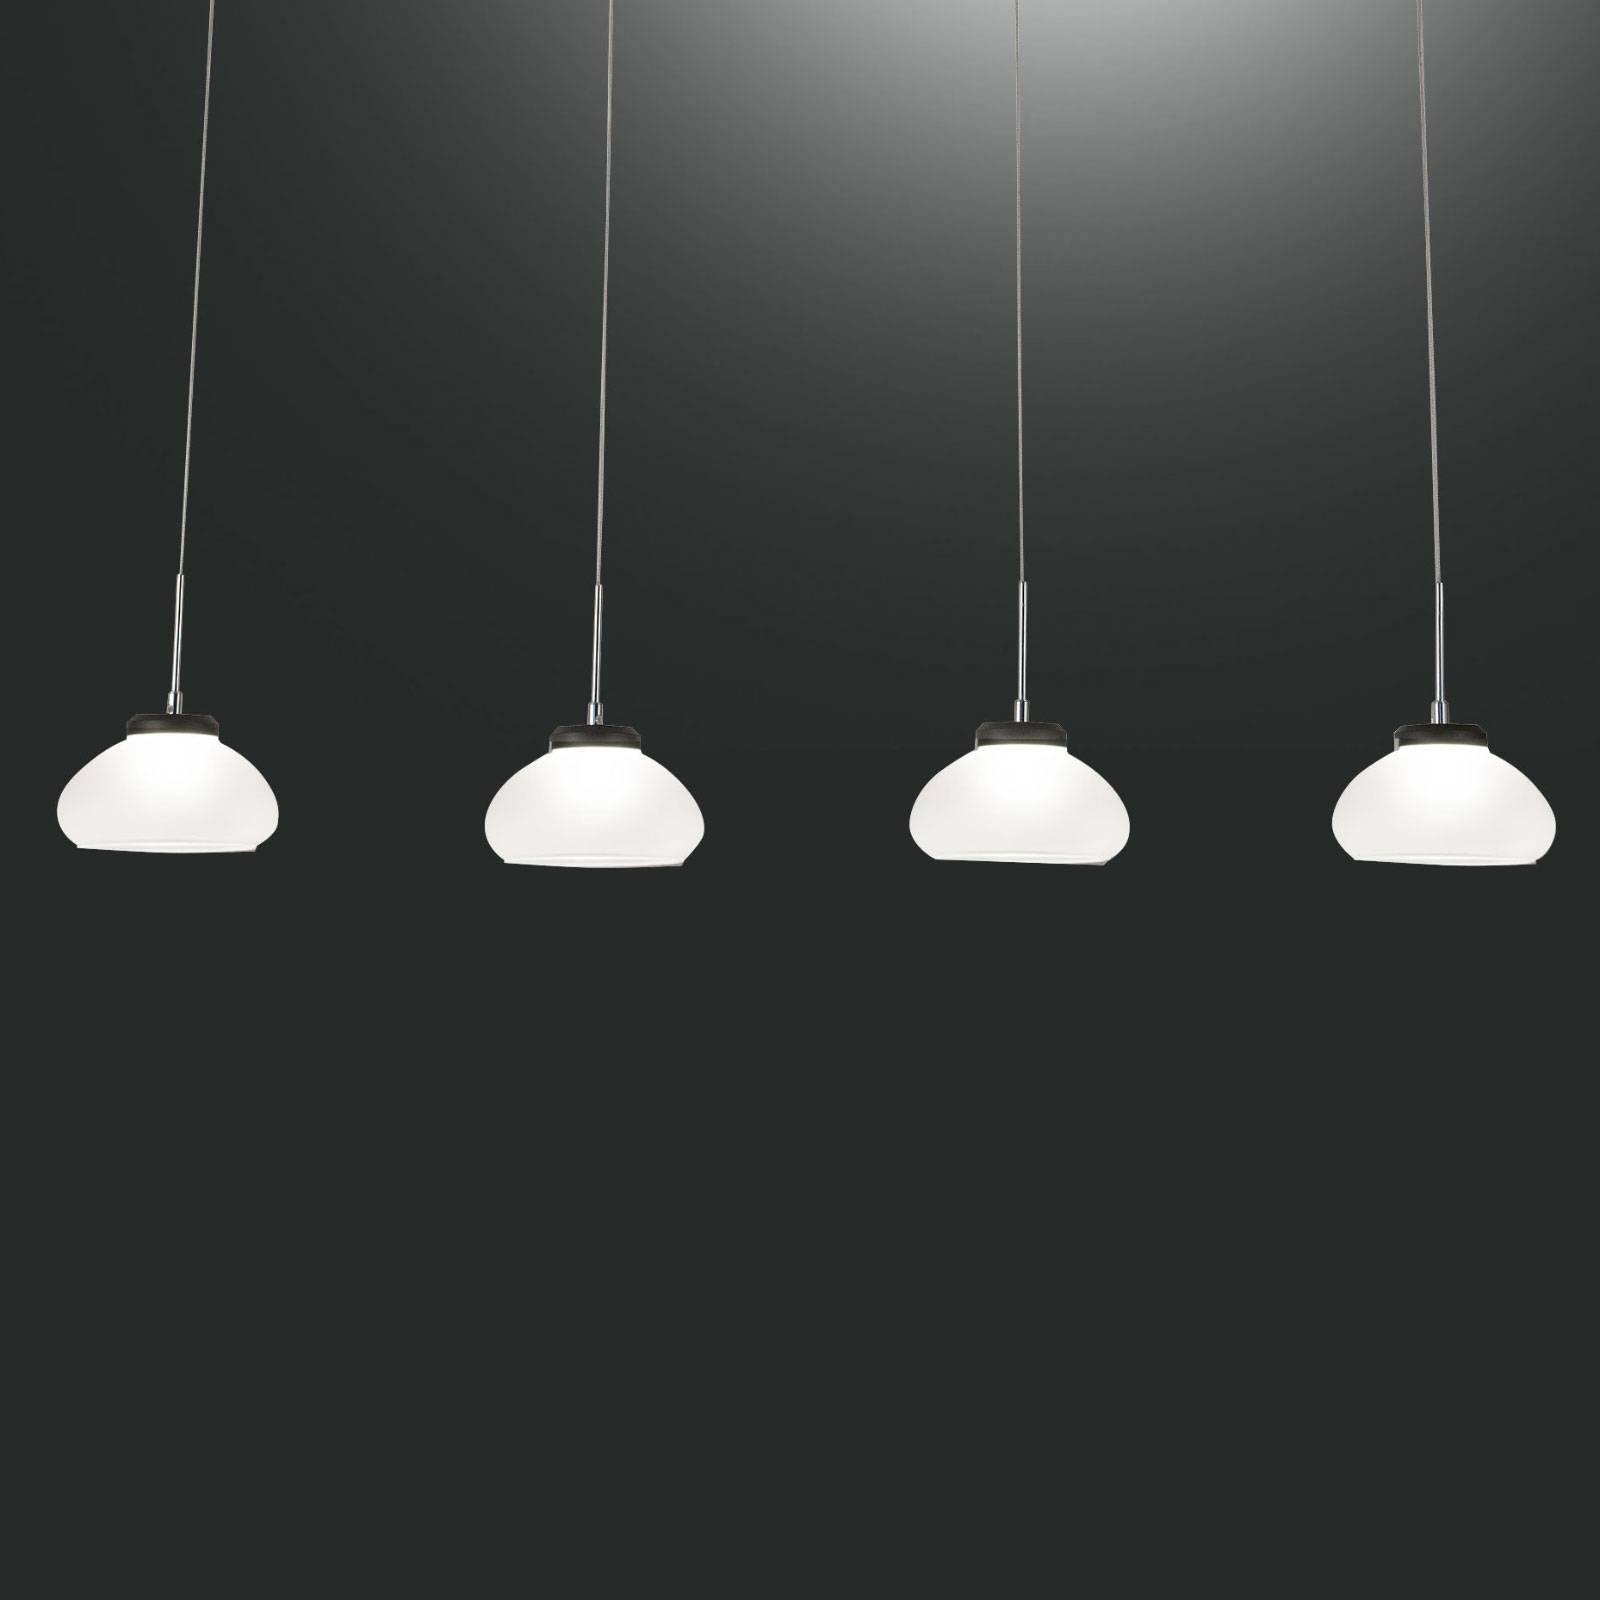 Hanglamp Arabella 4-lamps in rij, wit